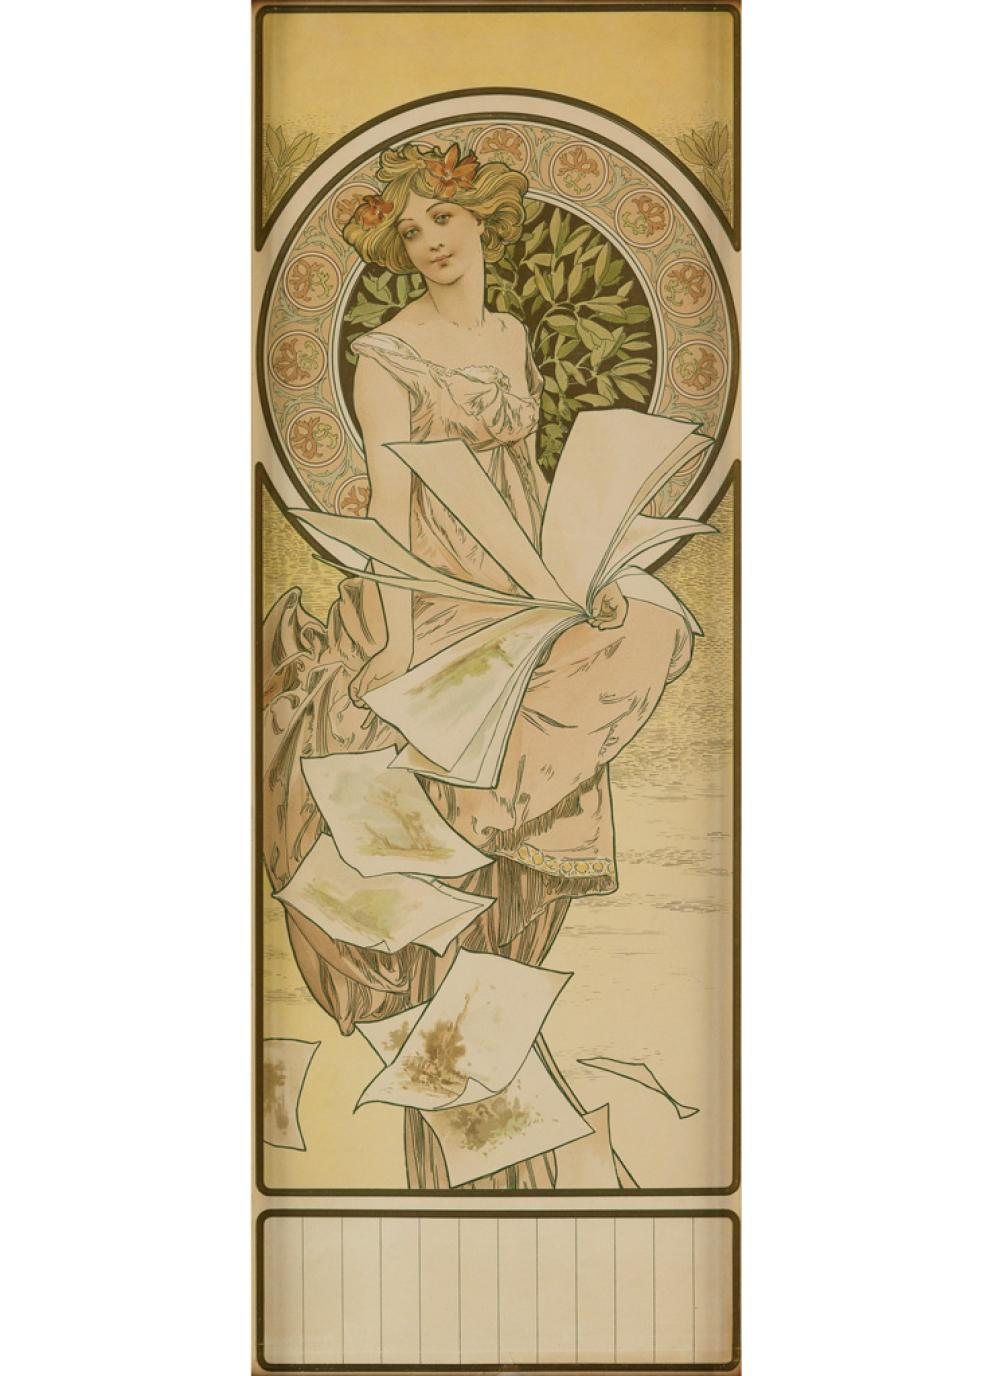 ALPHONSE MUCHA (1860-1939). [CHAMPENOIS CALENDAR.] Circa 1898. 22x8 inches 56x21,cm. [F. Champenois, Paris.]